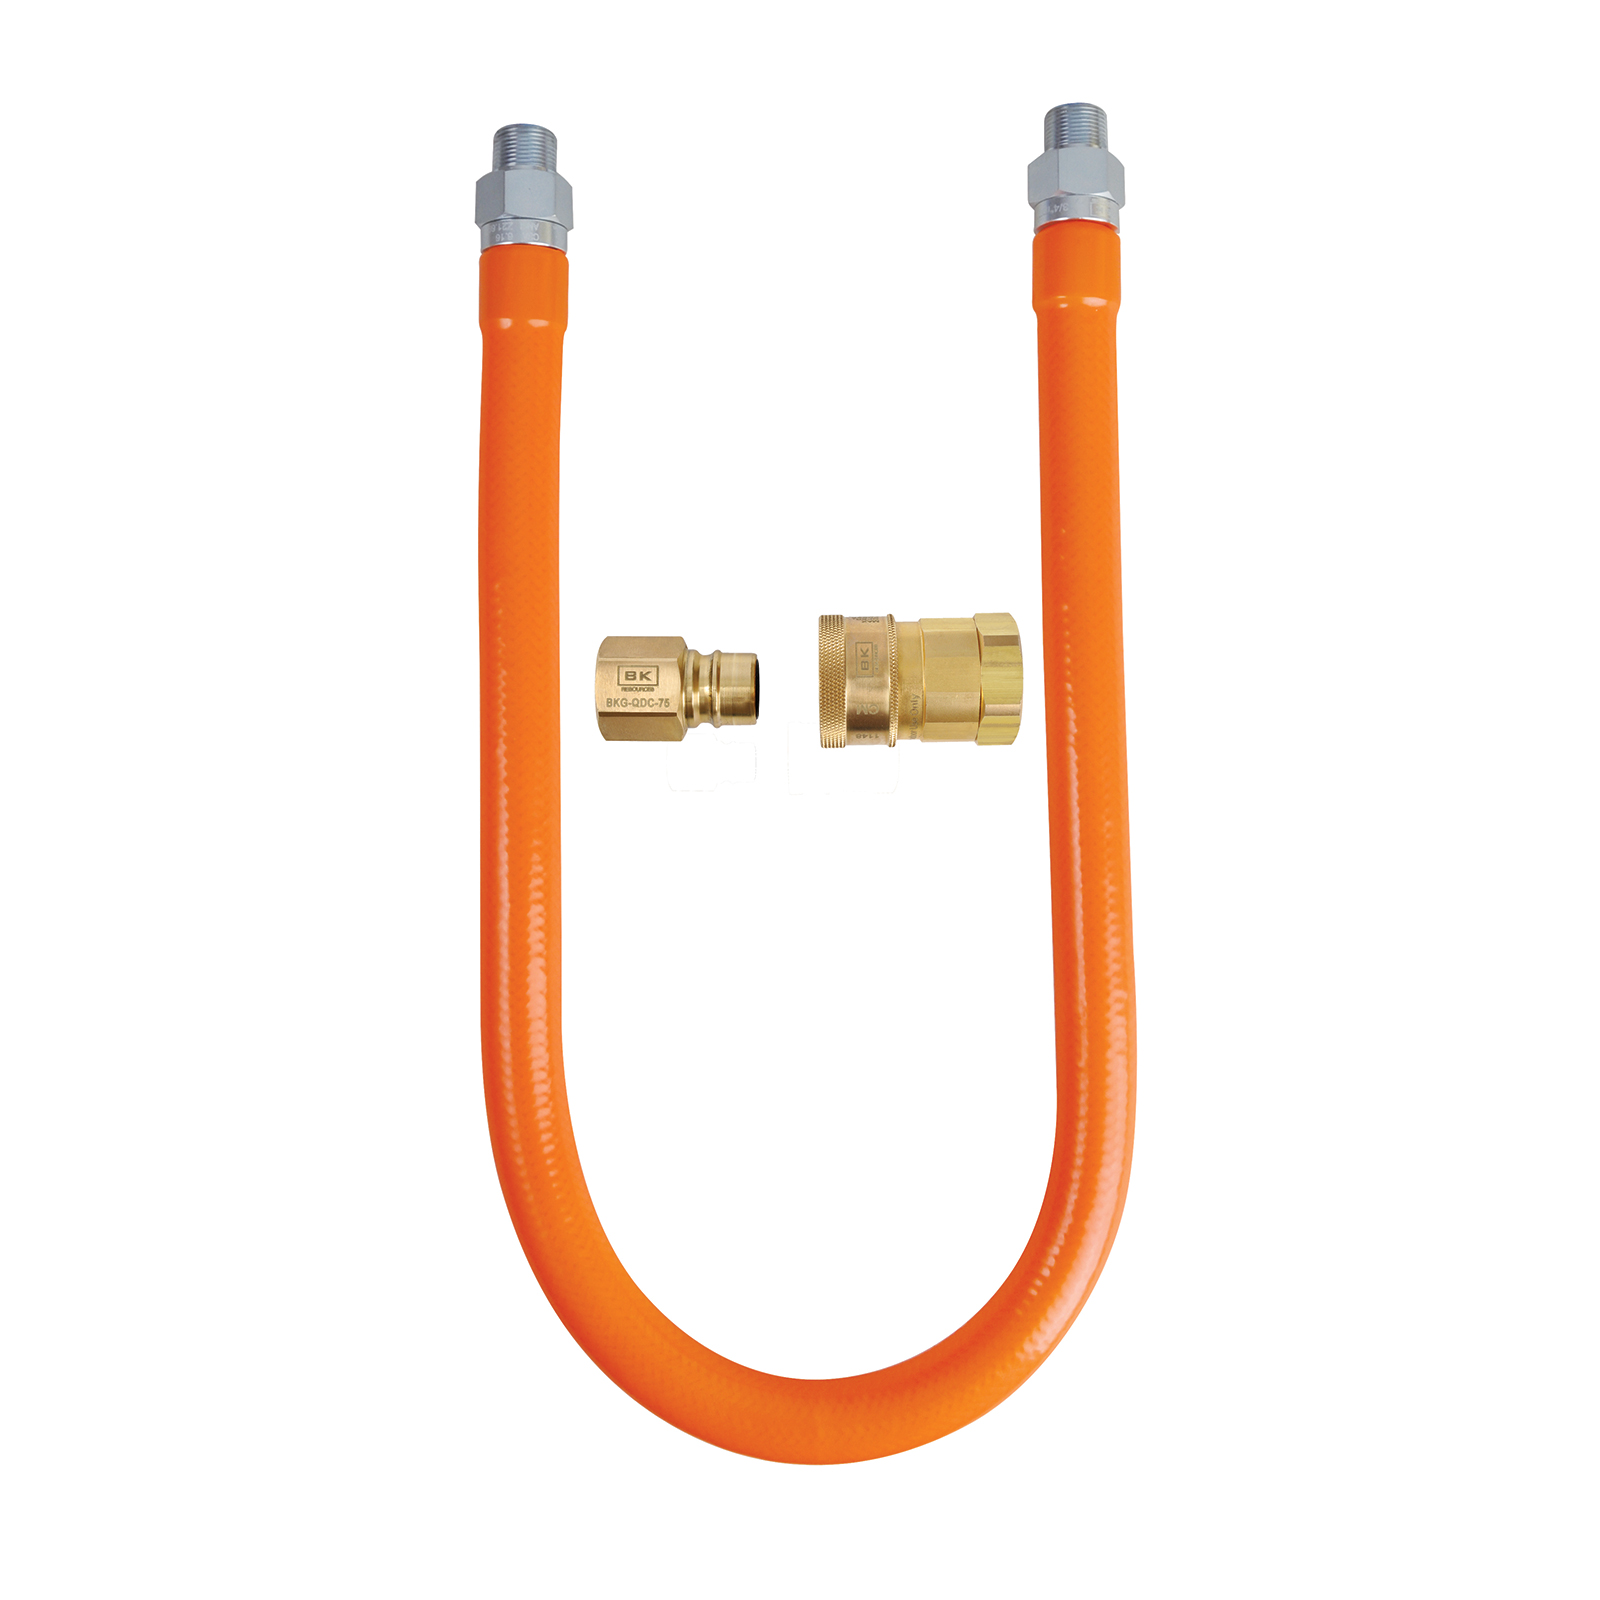 BK Resources BKG-GHC-7524-QD-PT gas connector hose kit